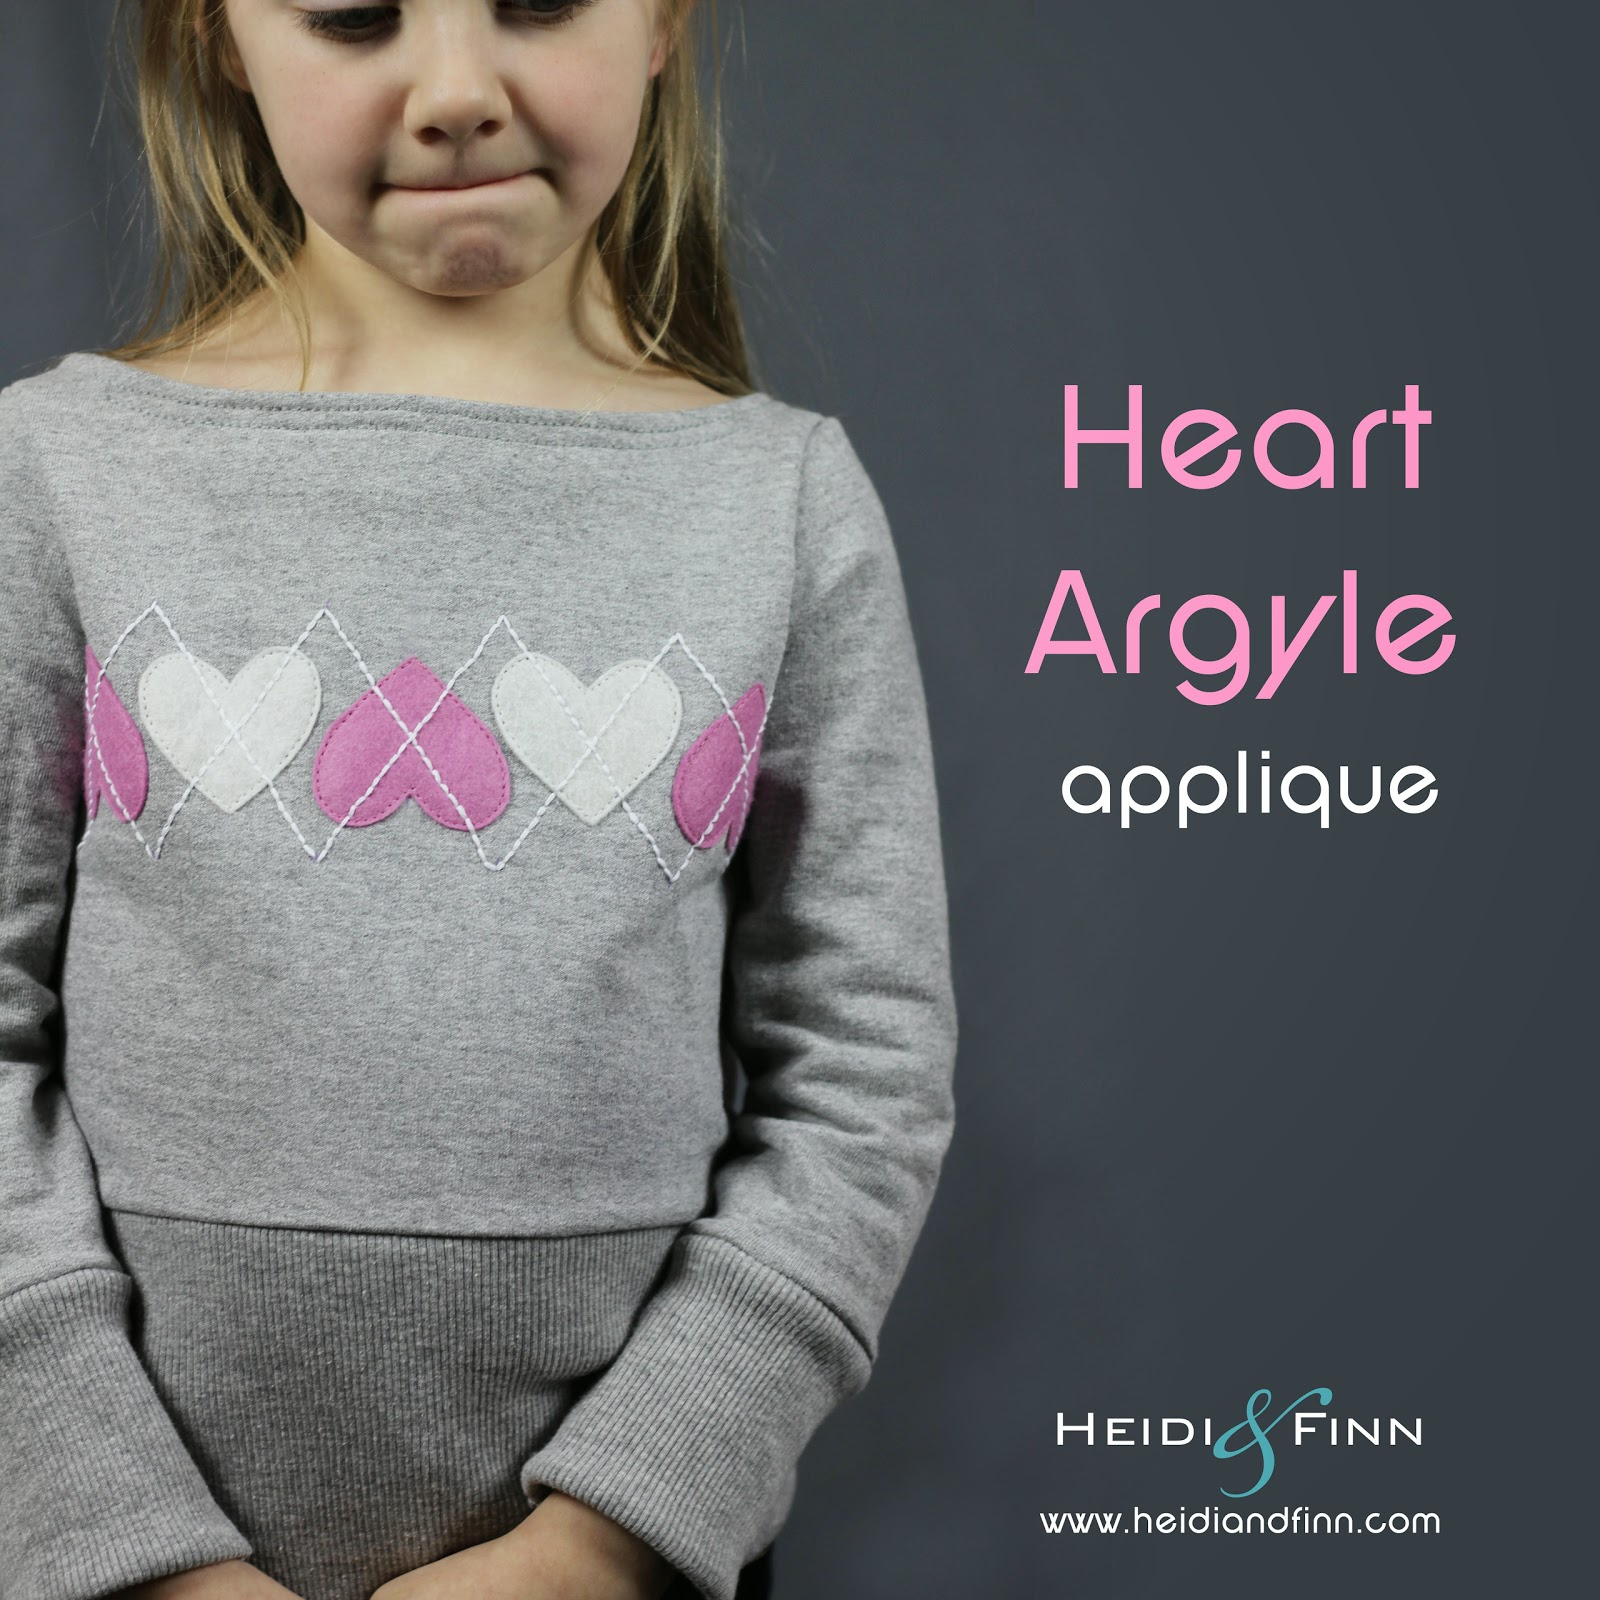 http://www.heidiandfinn.com/2014/01/valentines-argyle-sweater-tutorial.html